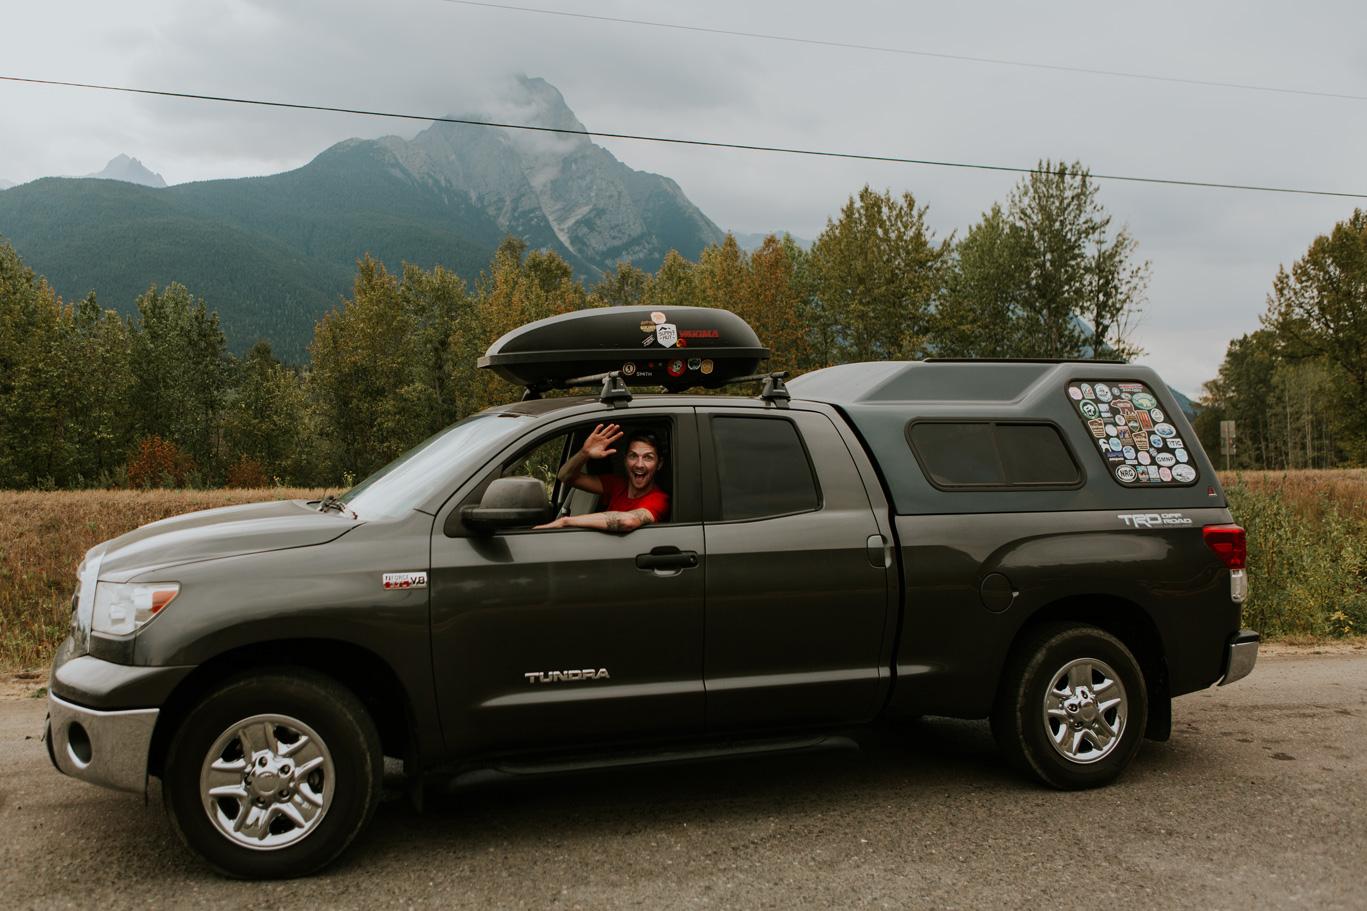 CindyGiovagnoli_BritishColumbia_Yukon_Alaska_roadtrip_AlCan_Alaskan_Highway_truck_camping-015.jpg